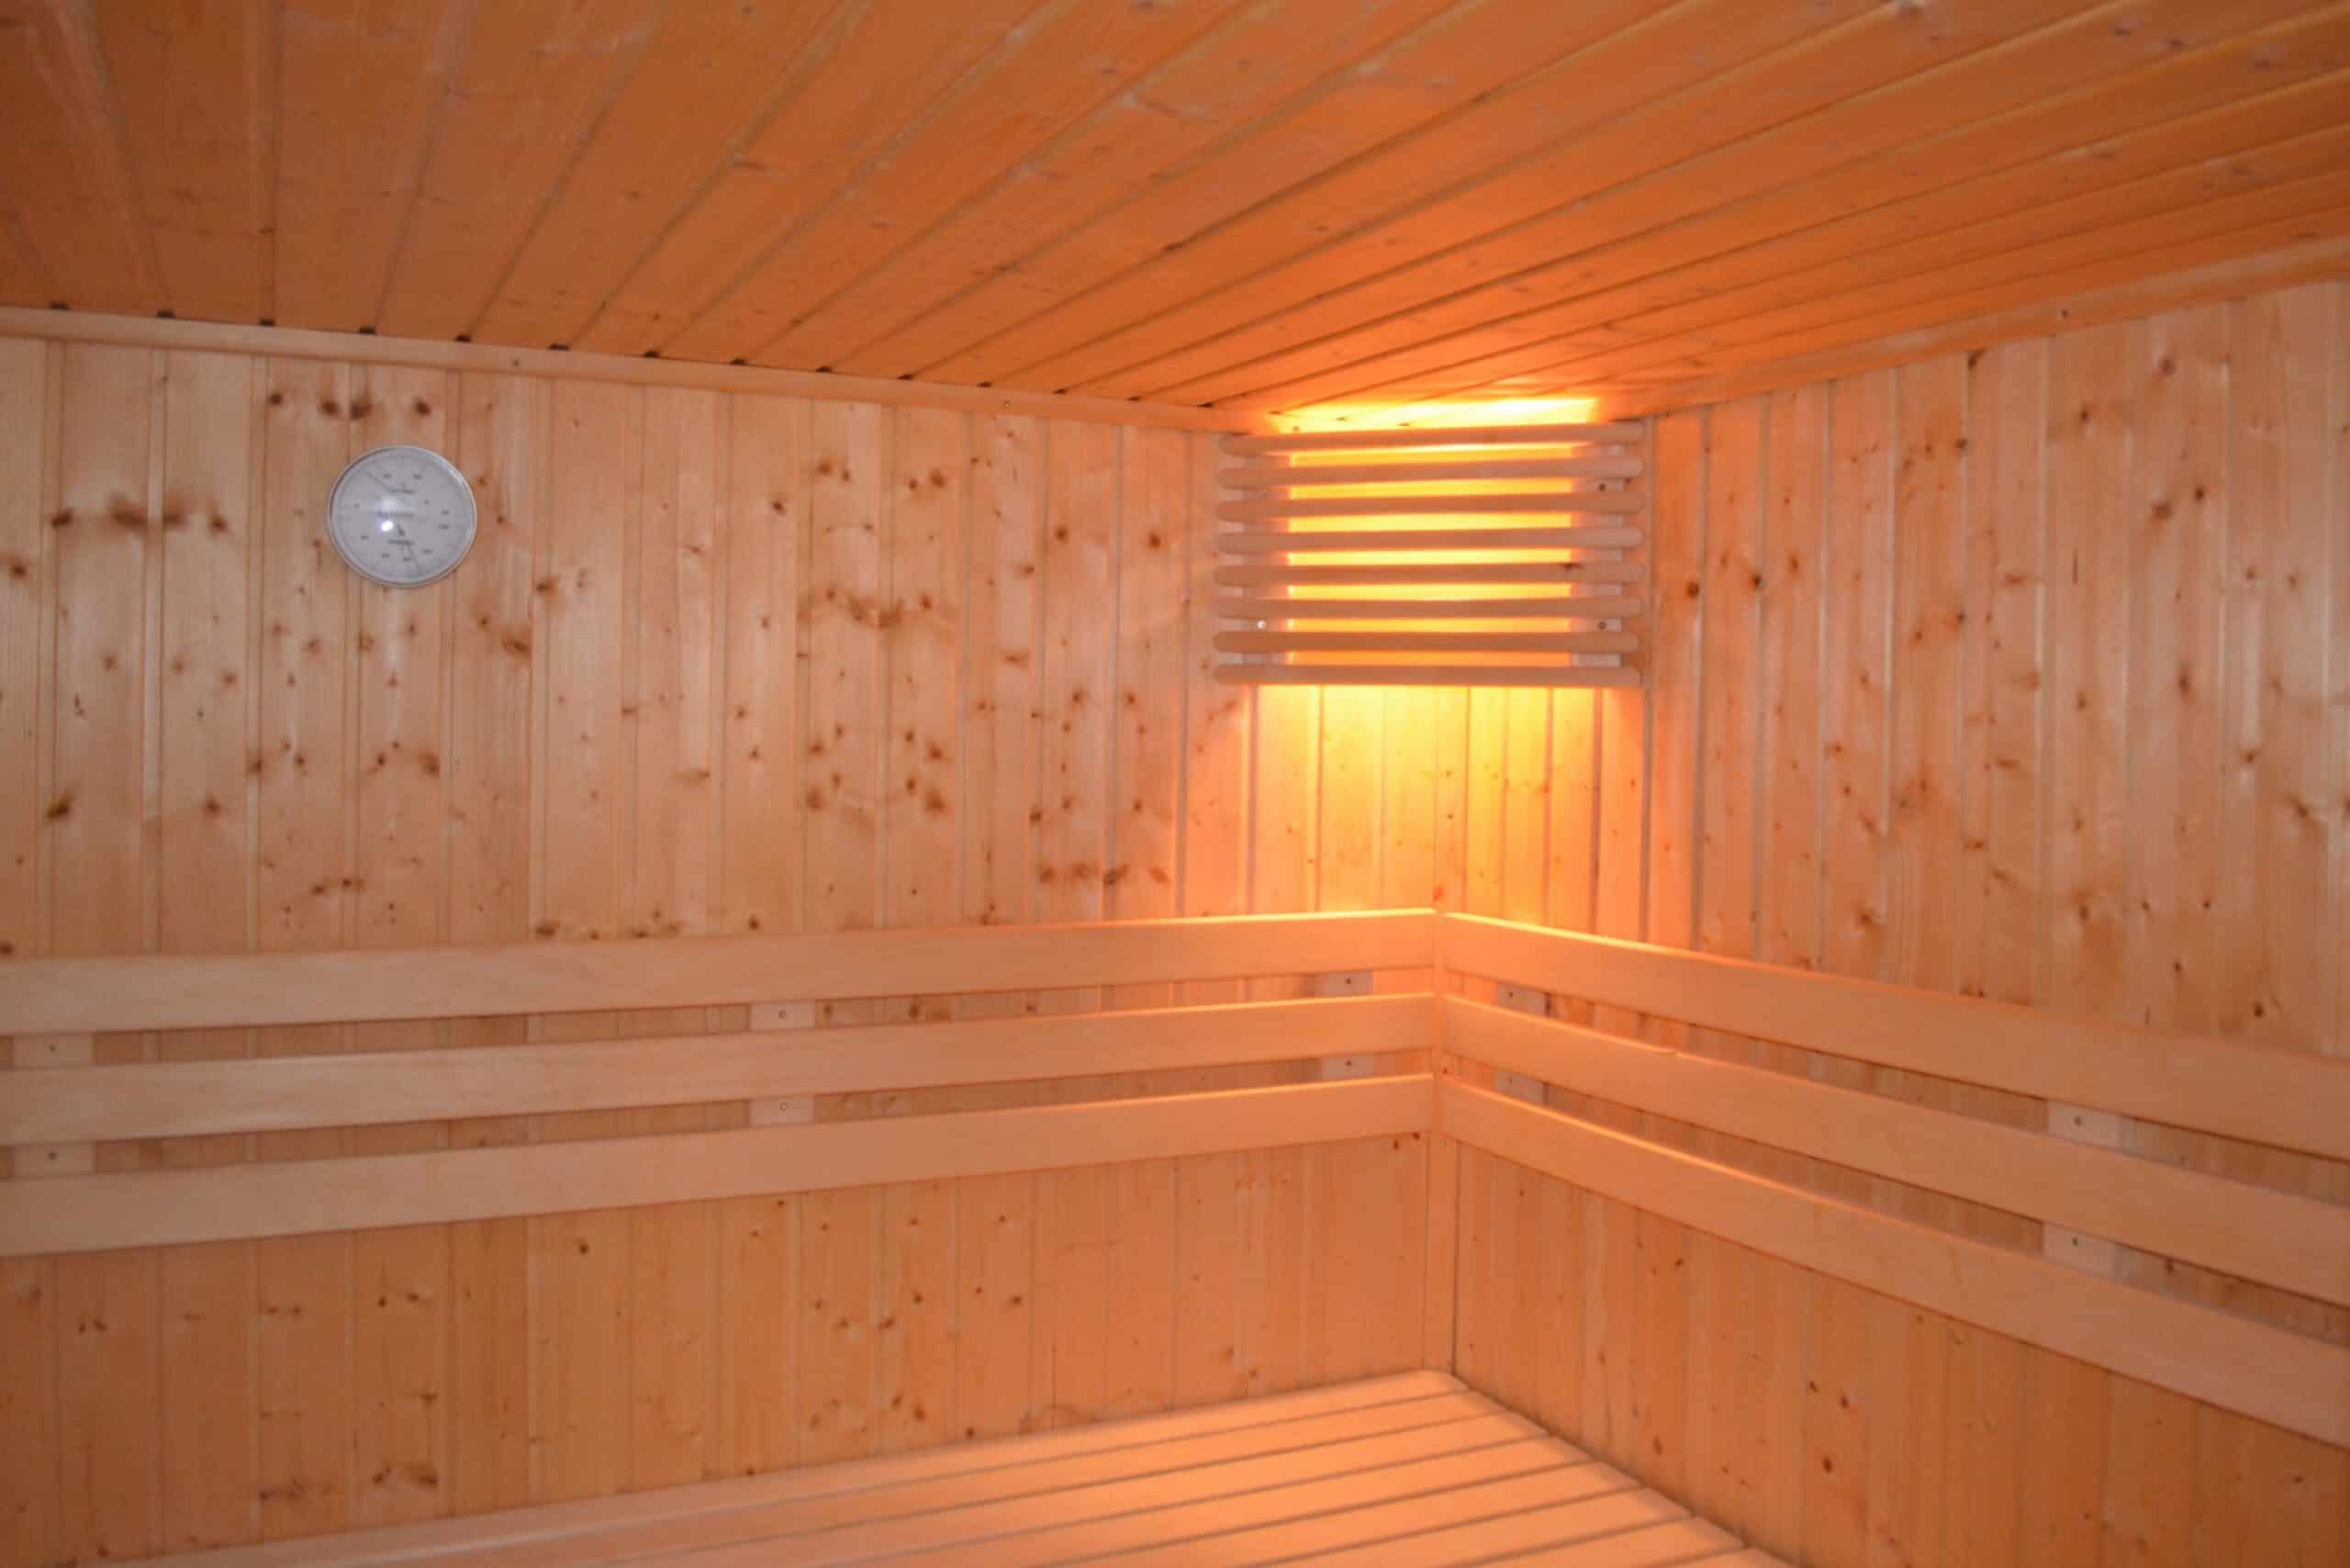 sauna, lamp, heat